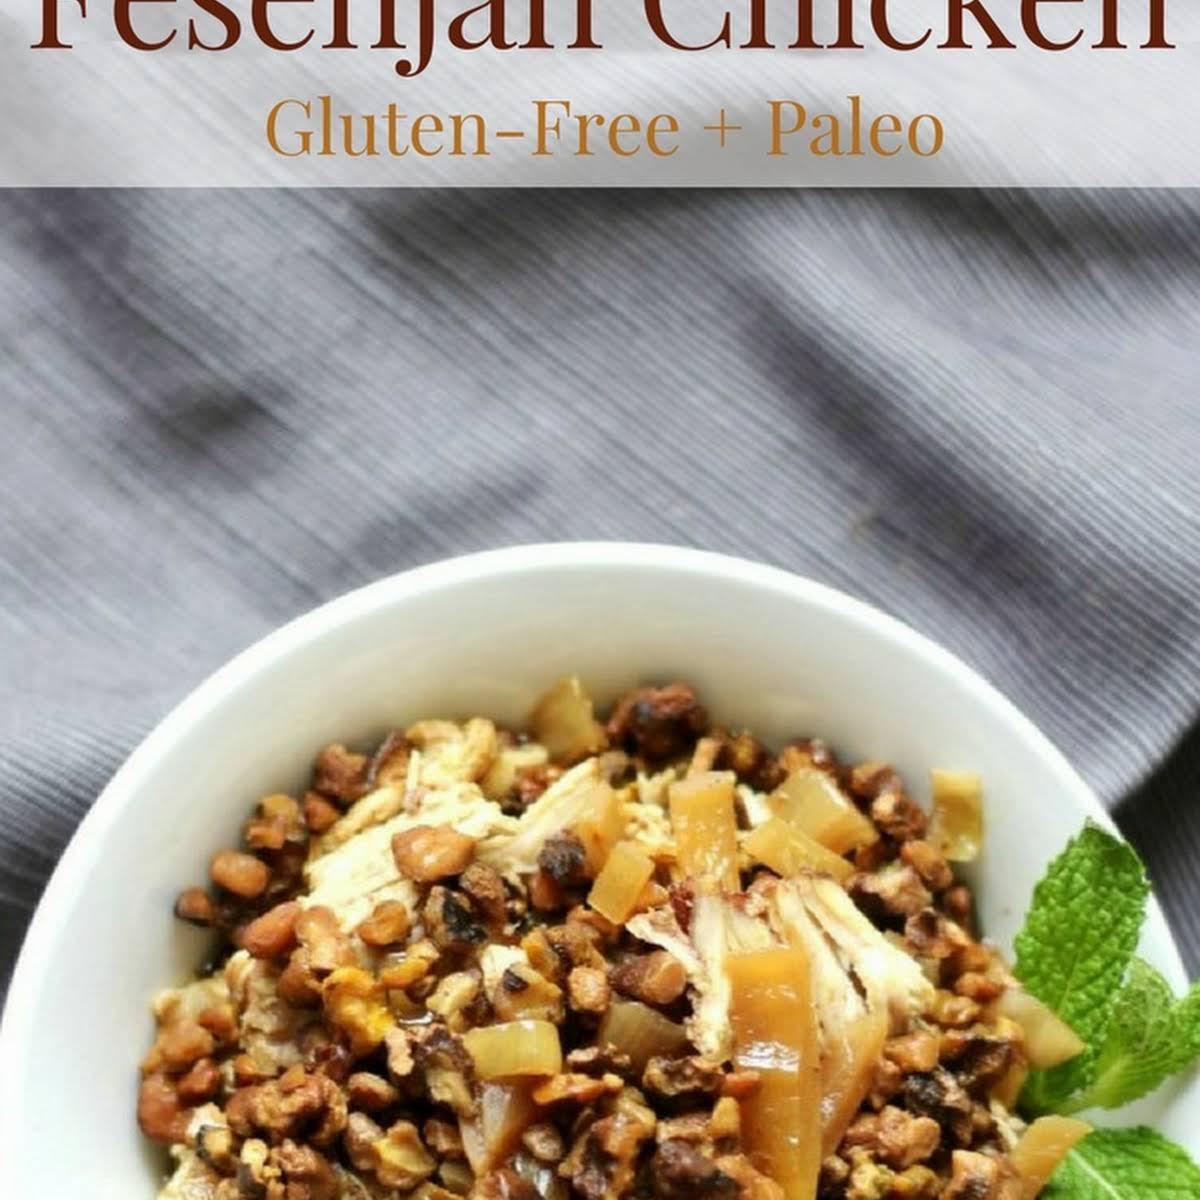 Slow Cooker Fesenjan Chicken Gluten Free Paleo